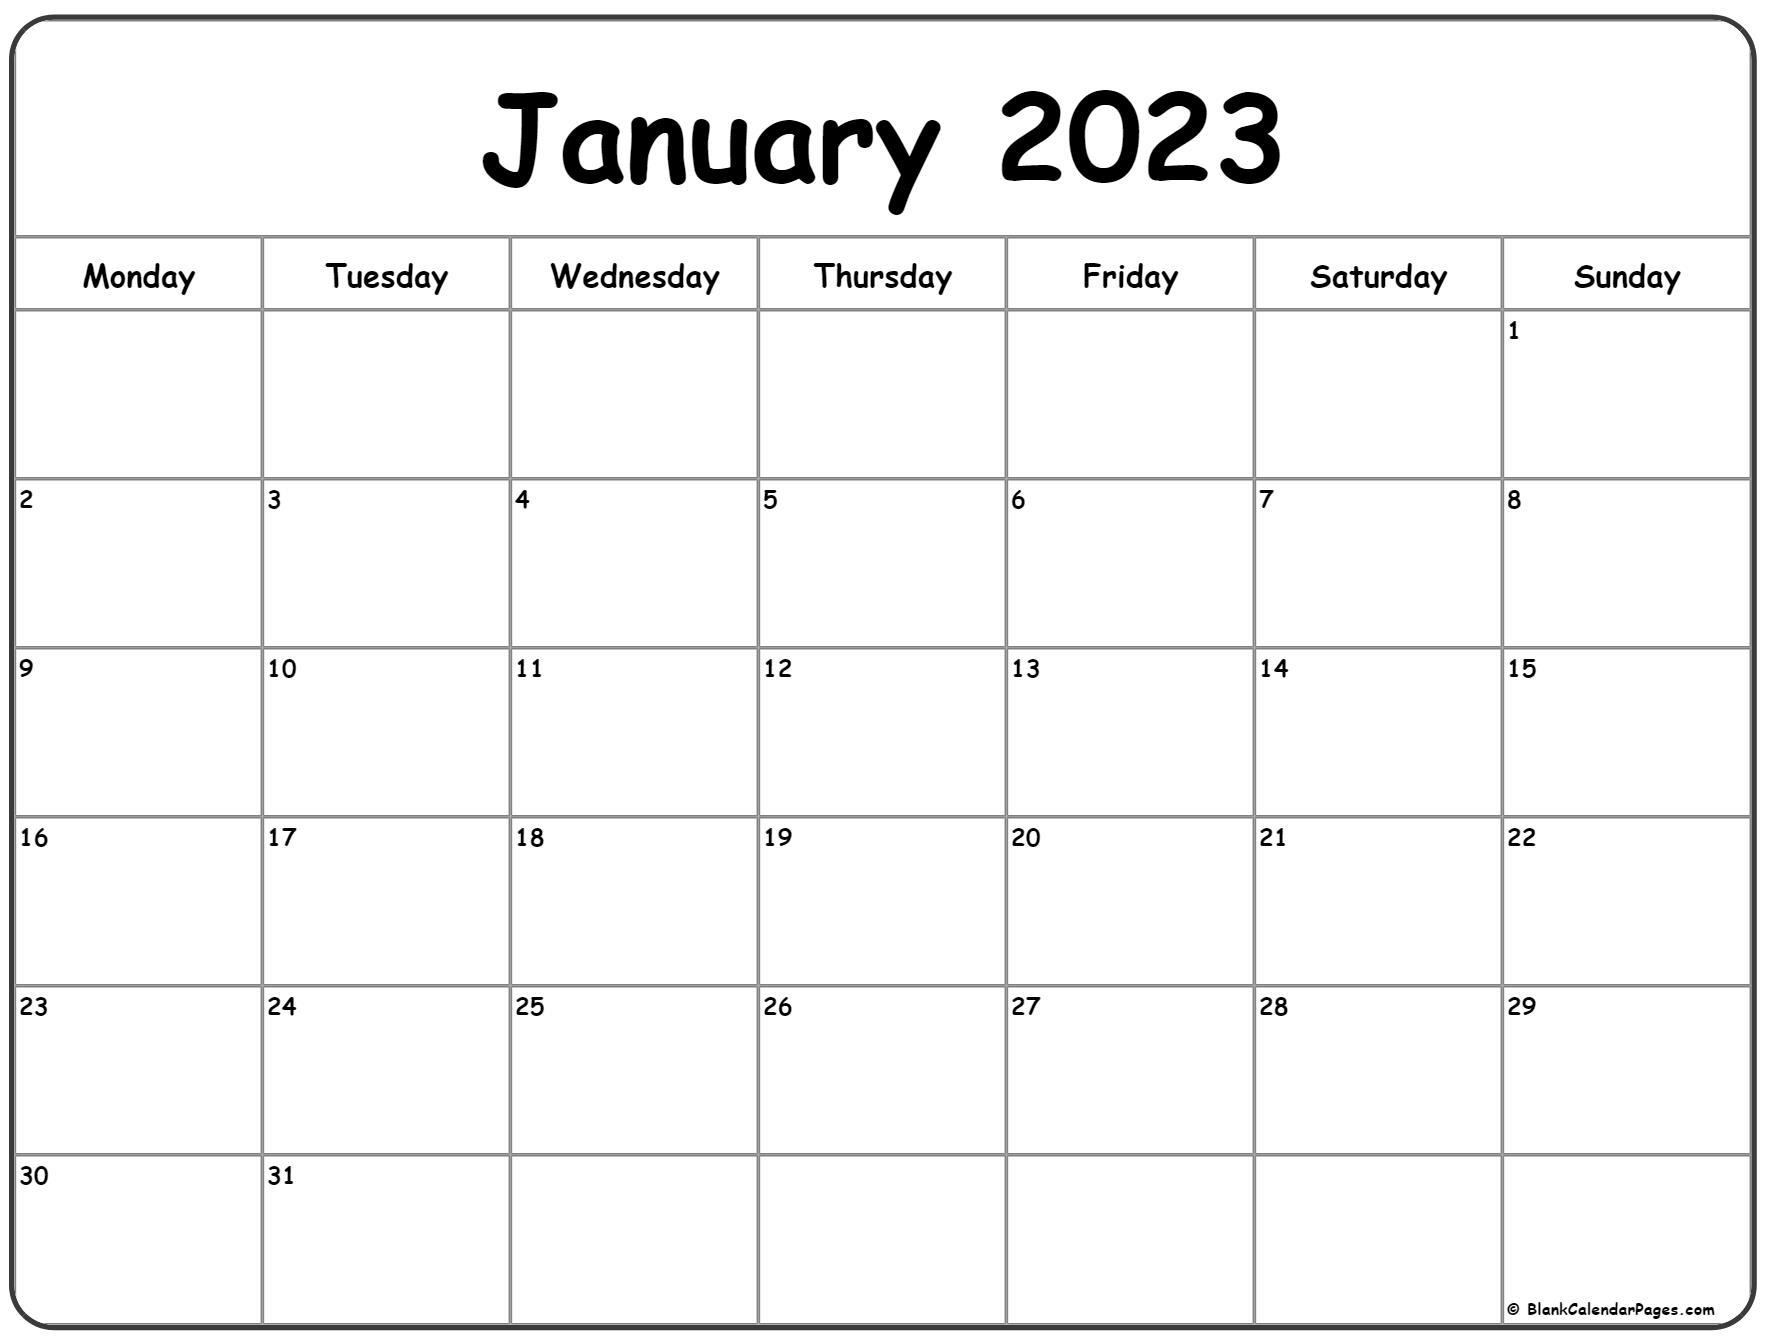 January 2022 Monday Calendar | Monday to Sunday